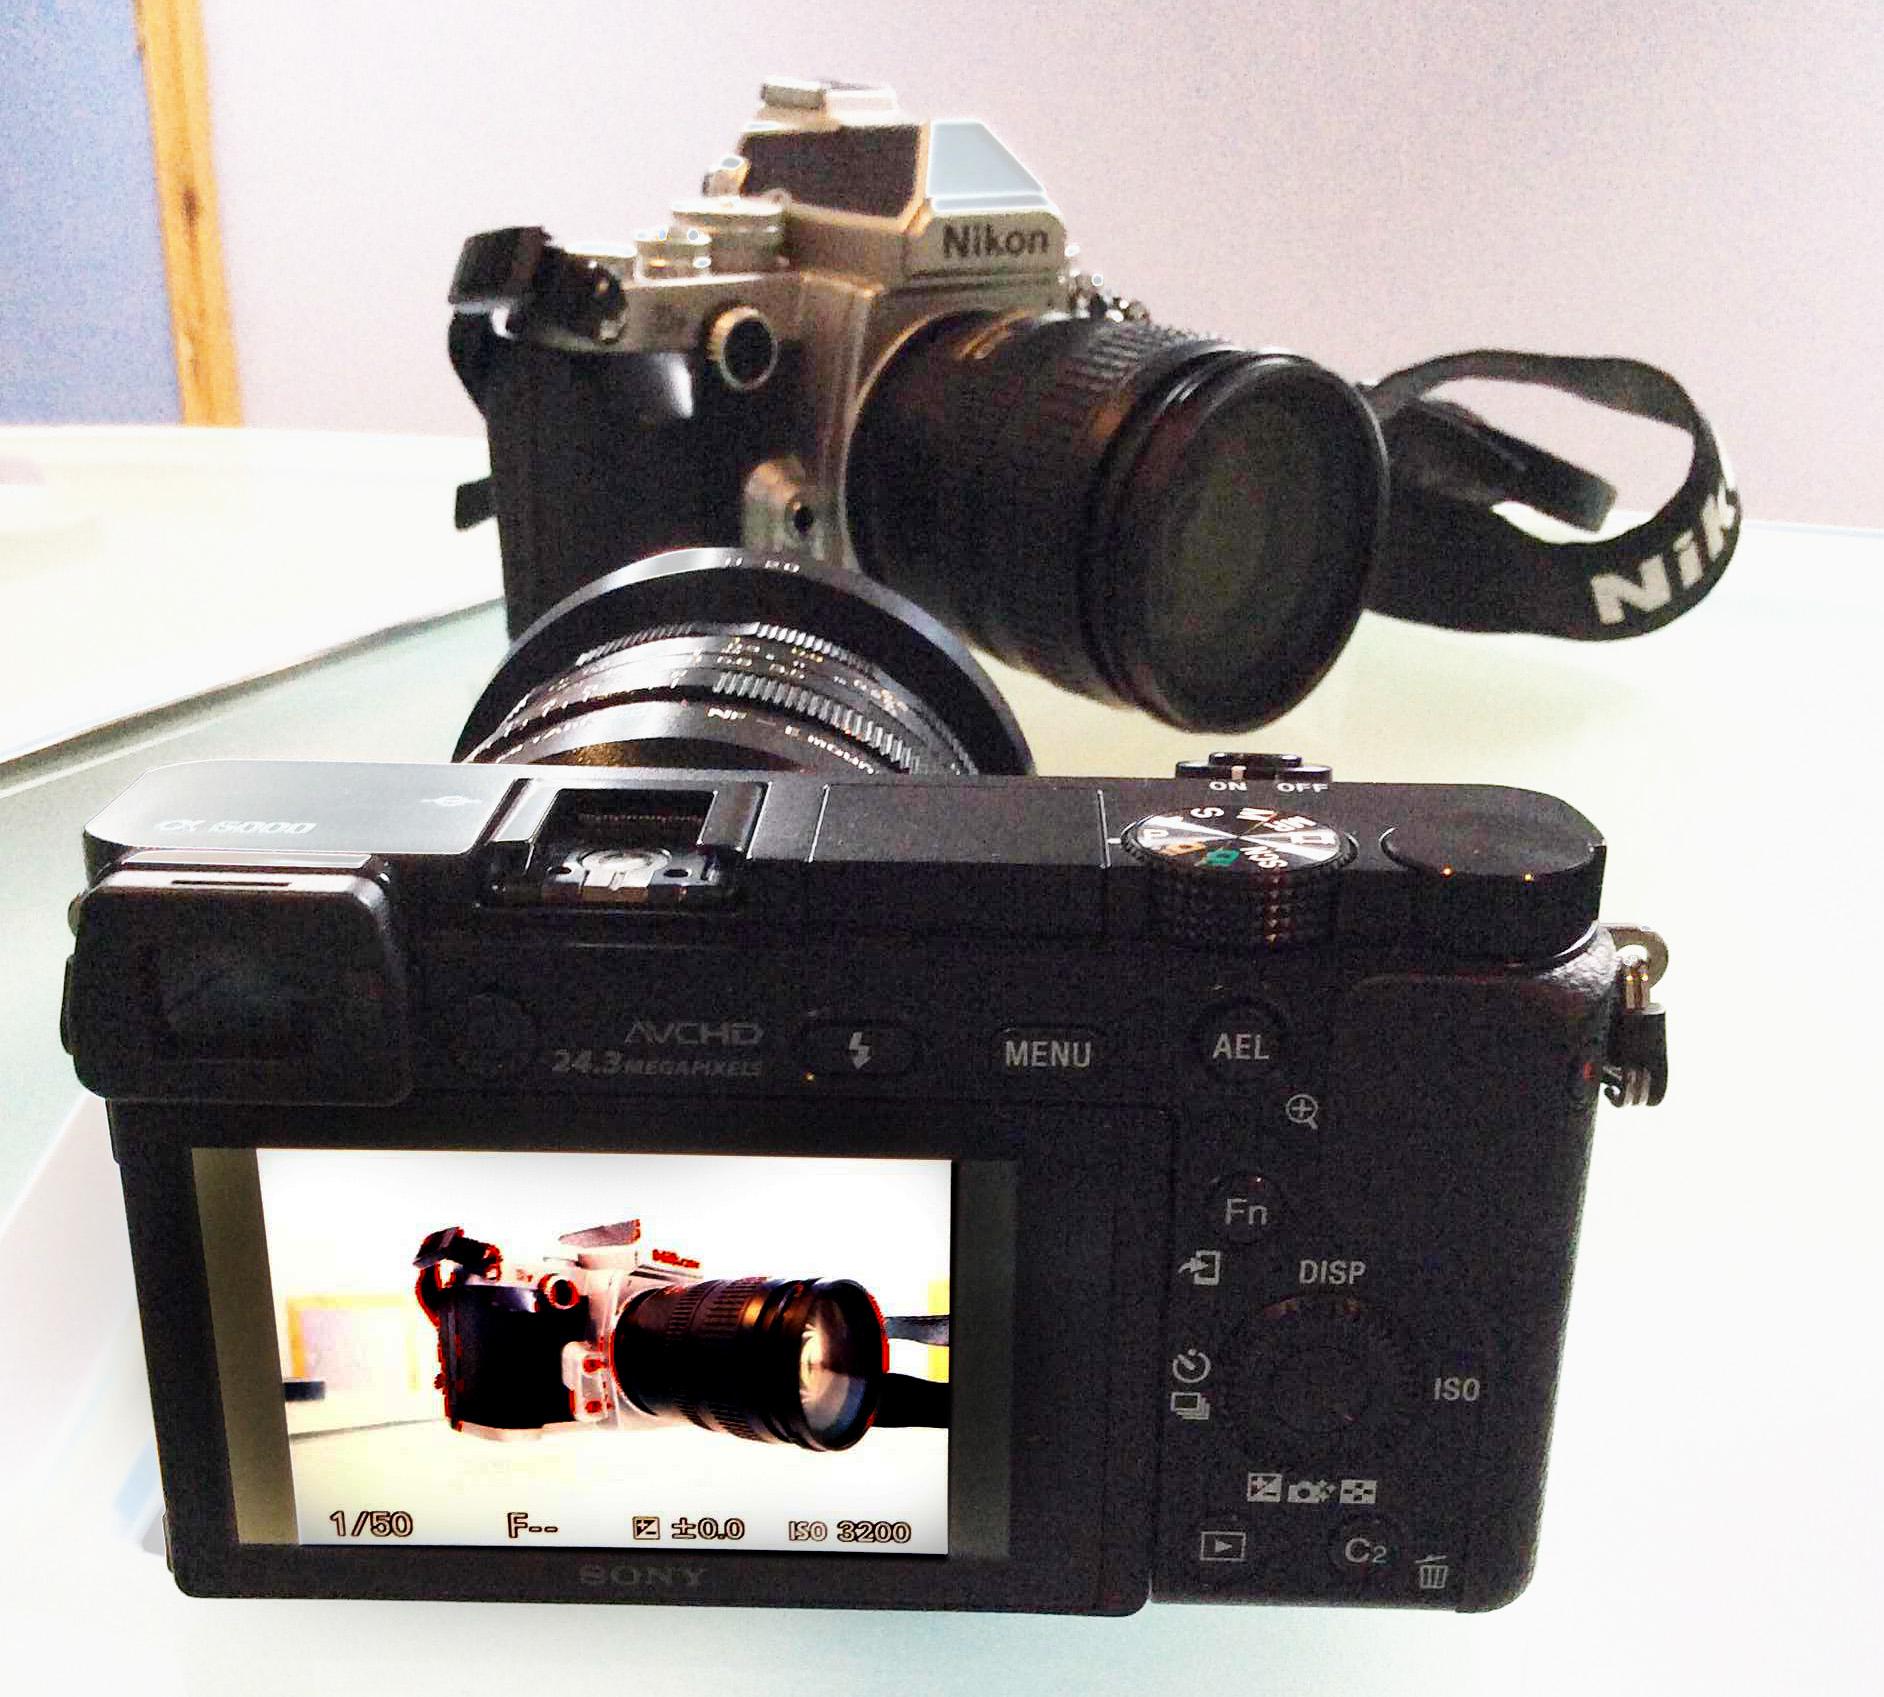 Sony a6000, Voigtländer 20mm f/3.5SL-II AsphericalAI-P (Nikon F-Mount), Kipon Nikon F > e-mount adapter, Nikon Df